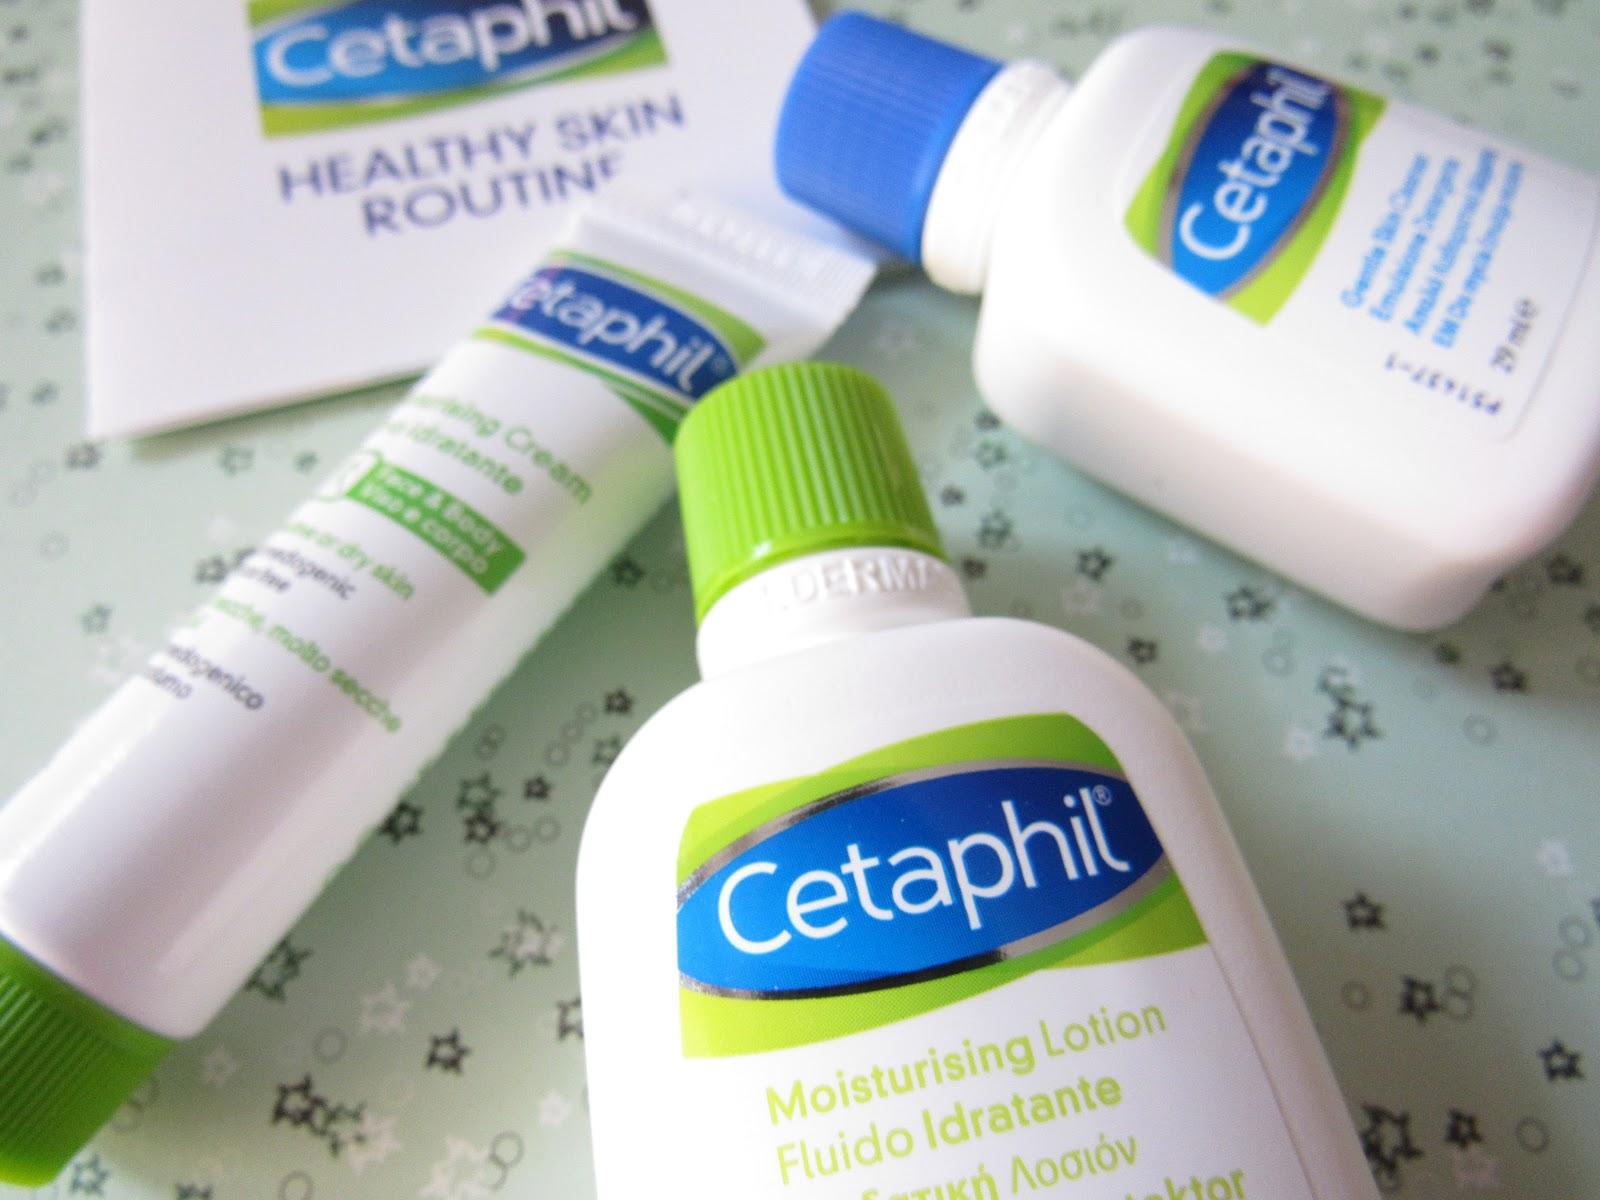 Blooming Fiction, lifestyle blog, Cetaphil Skincare Regime